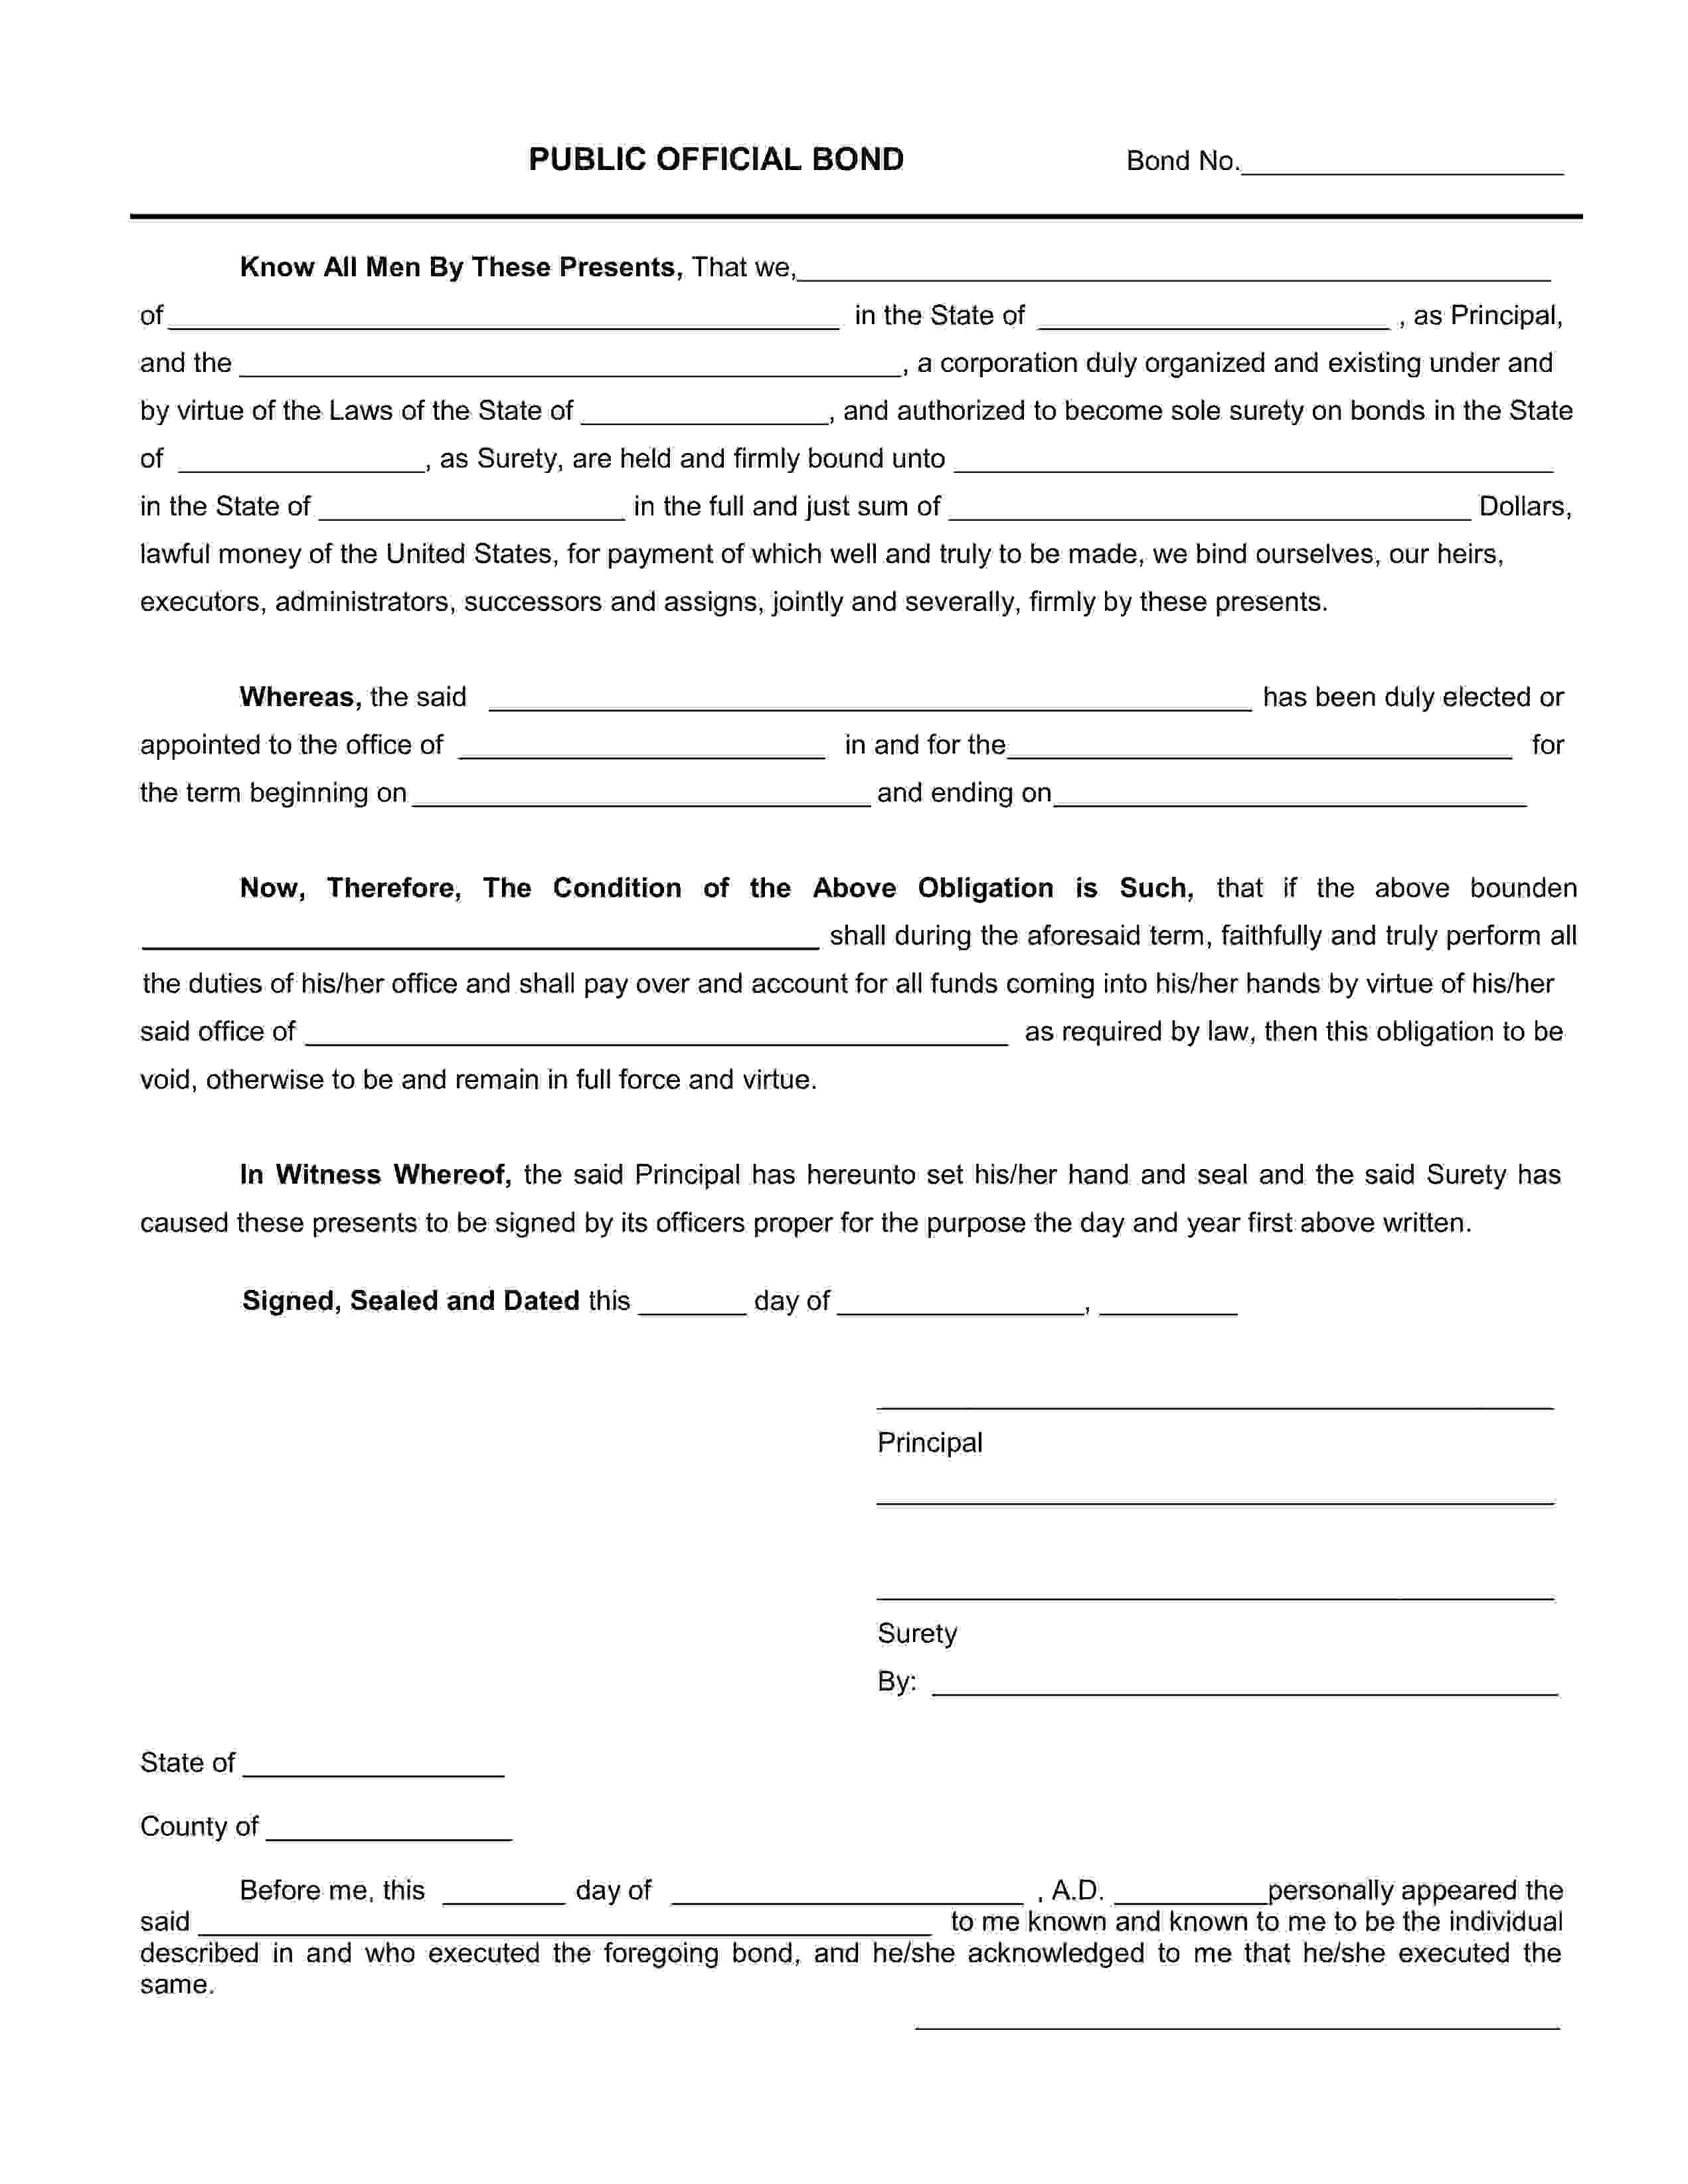 Treasurer or Tax Collector Bond sample image